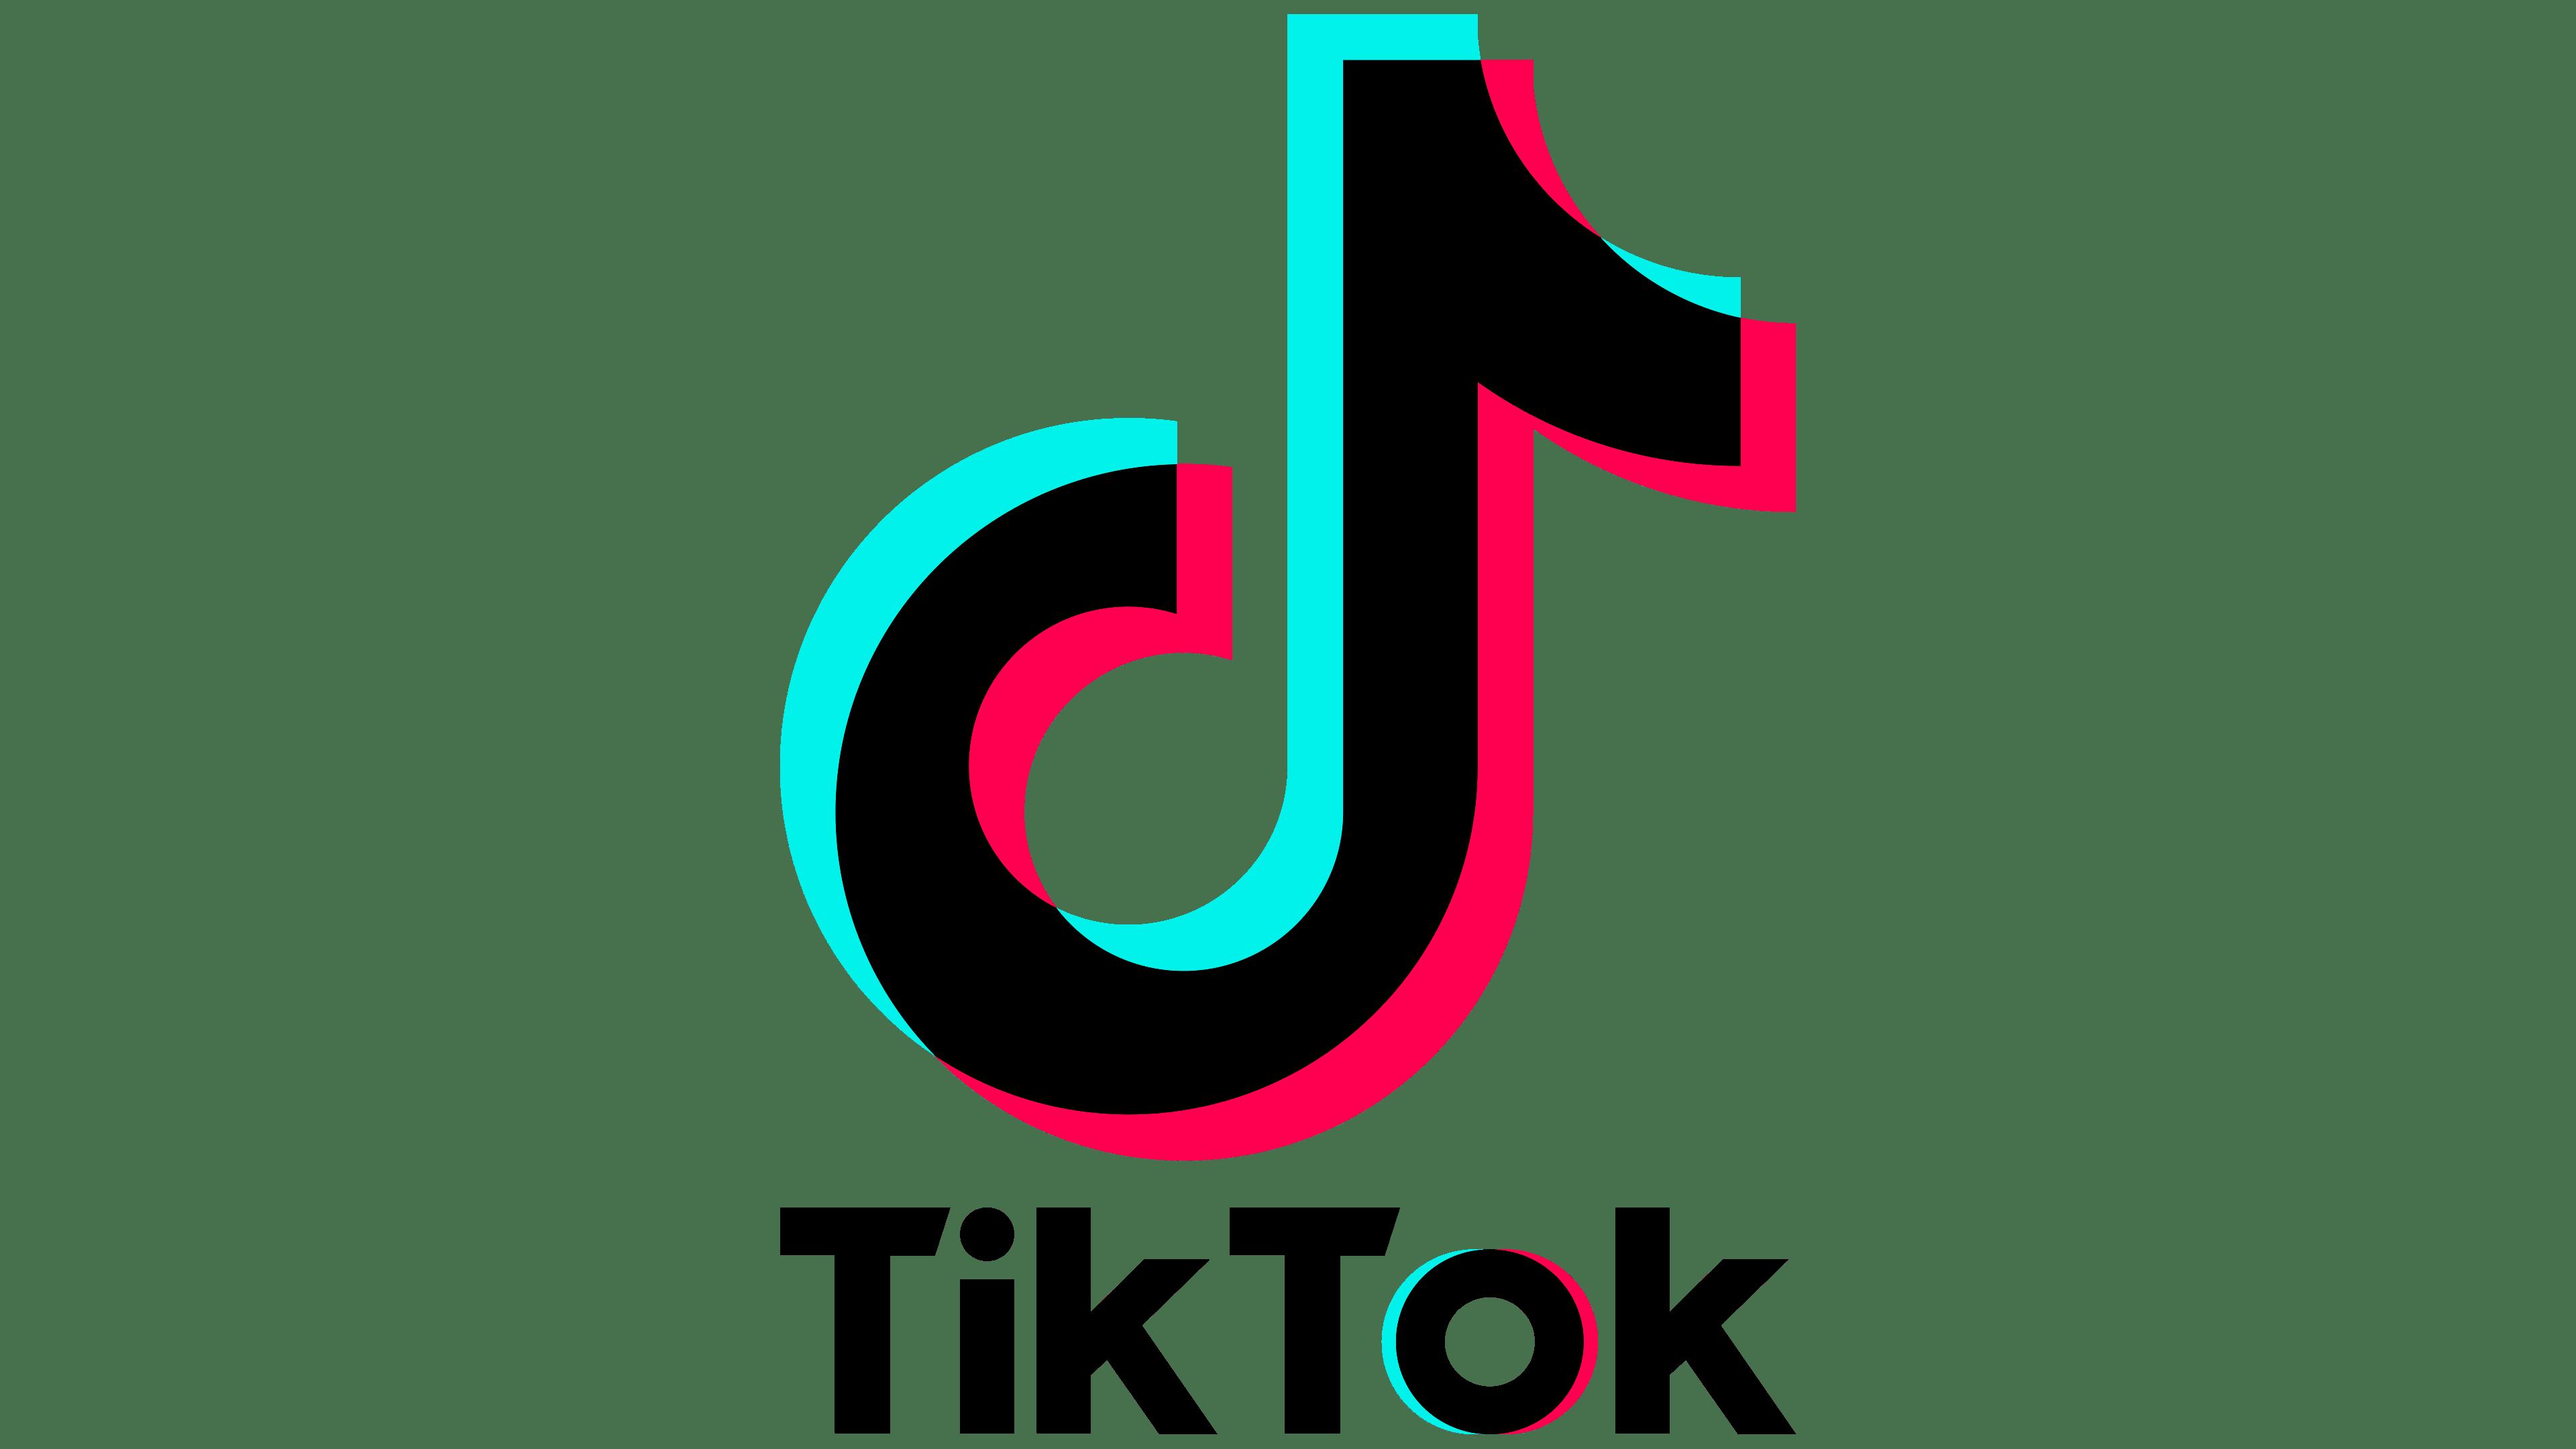 Bedeutung instagram symbole 😍 Emoji